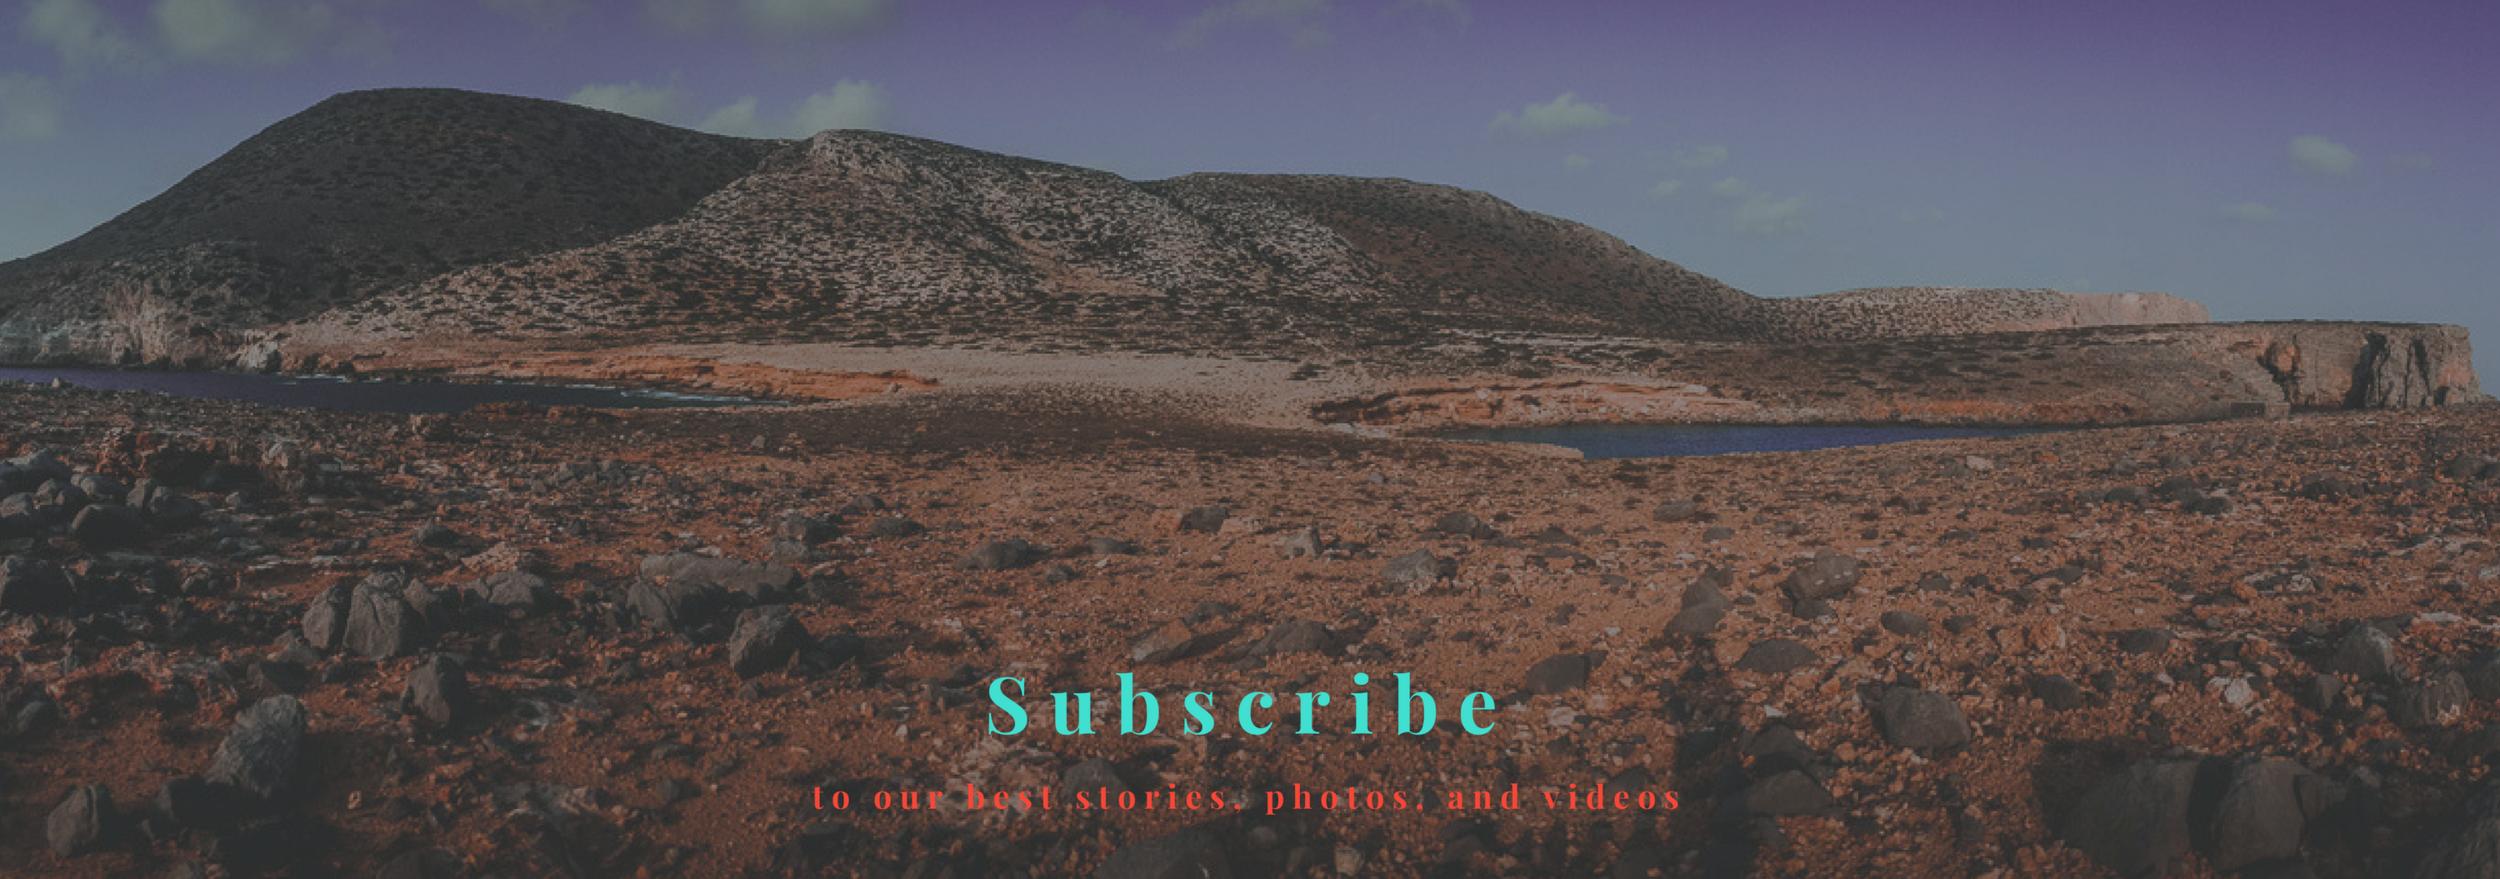 subscribe-kasos-greece-stemajourneys.com.png